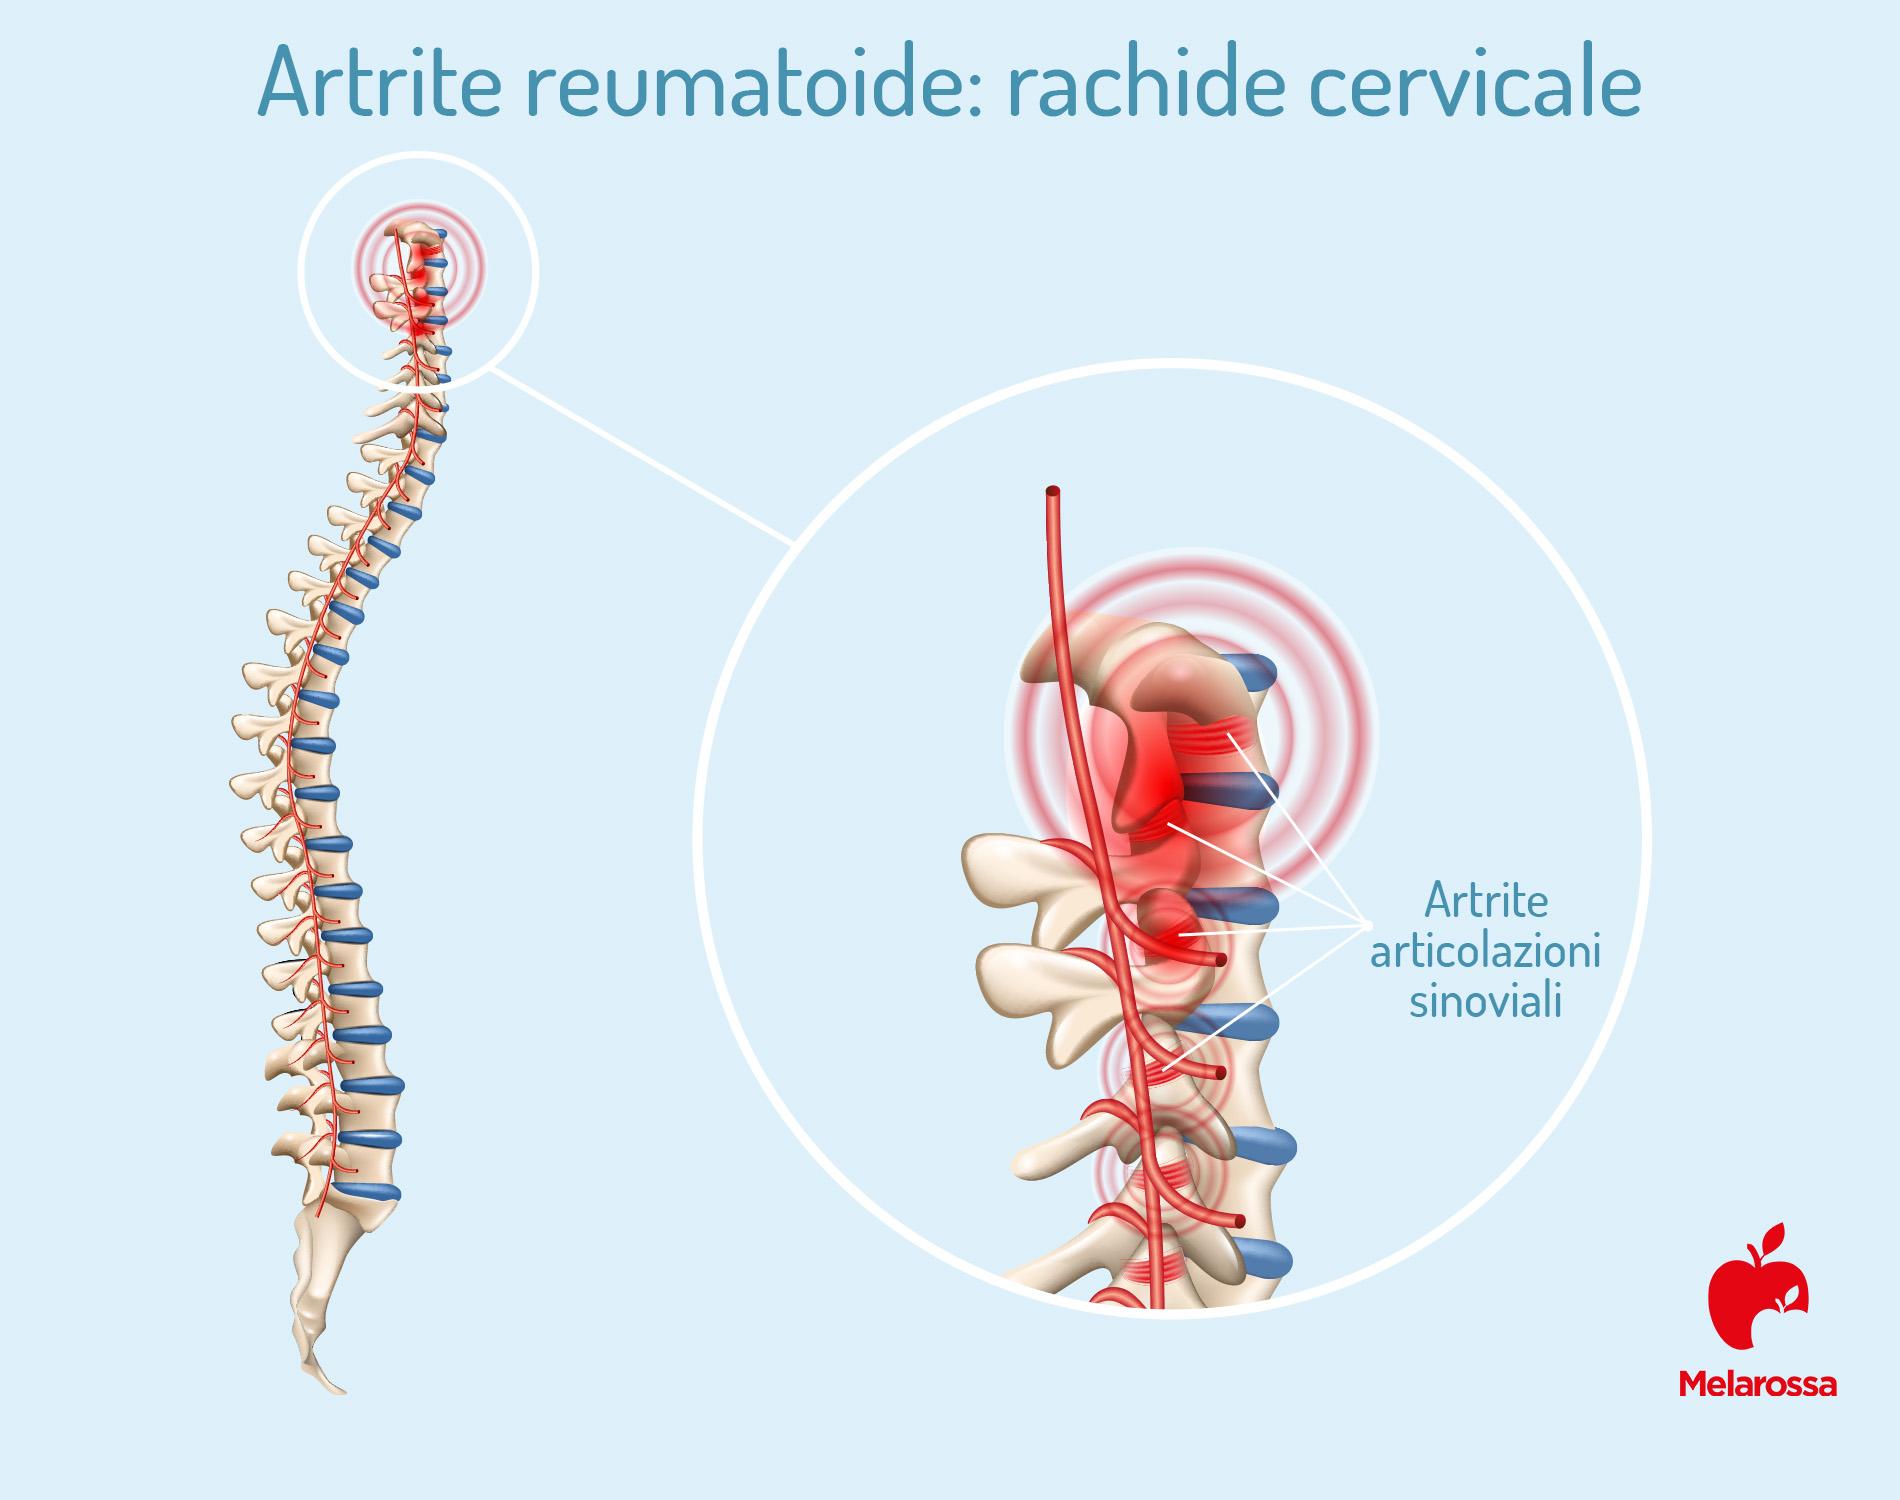 Artrite reumatoide: rachide cervicale